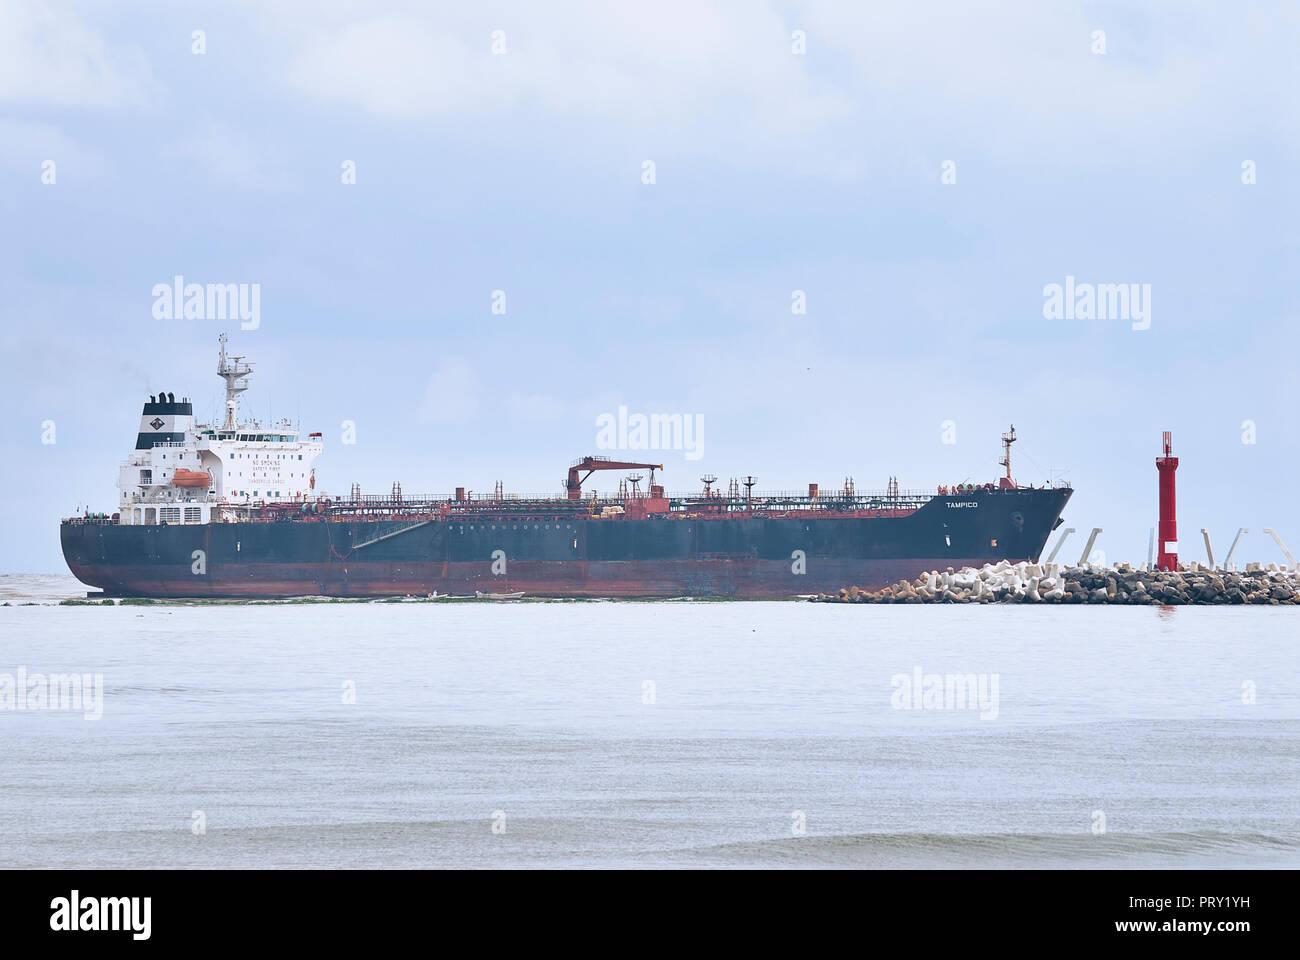 "COATZACOALCOS, VER/MEXICO - SEPT 28, 2018: ""Tampico"" oil and chemical tanker ship enters the river to the Pajaritos logistics terminal Stock Photo"